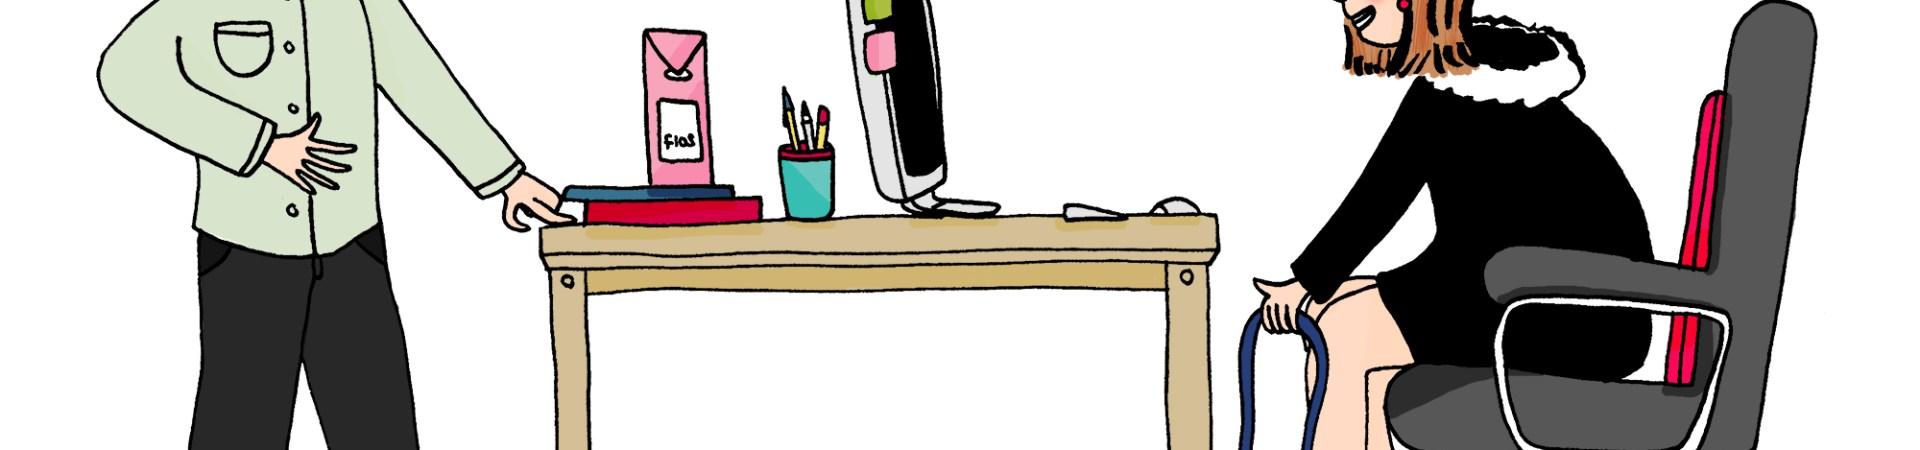 Etre en retard au boulot - Illustration by Drawingsandthings pour FourchetteBikini